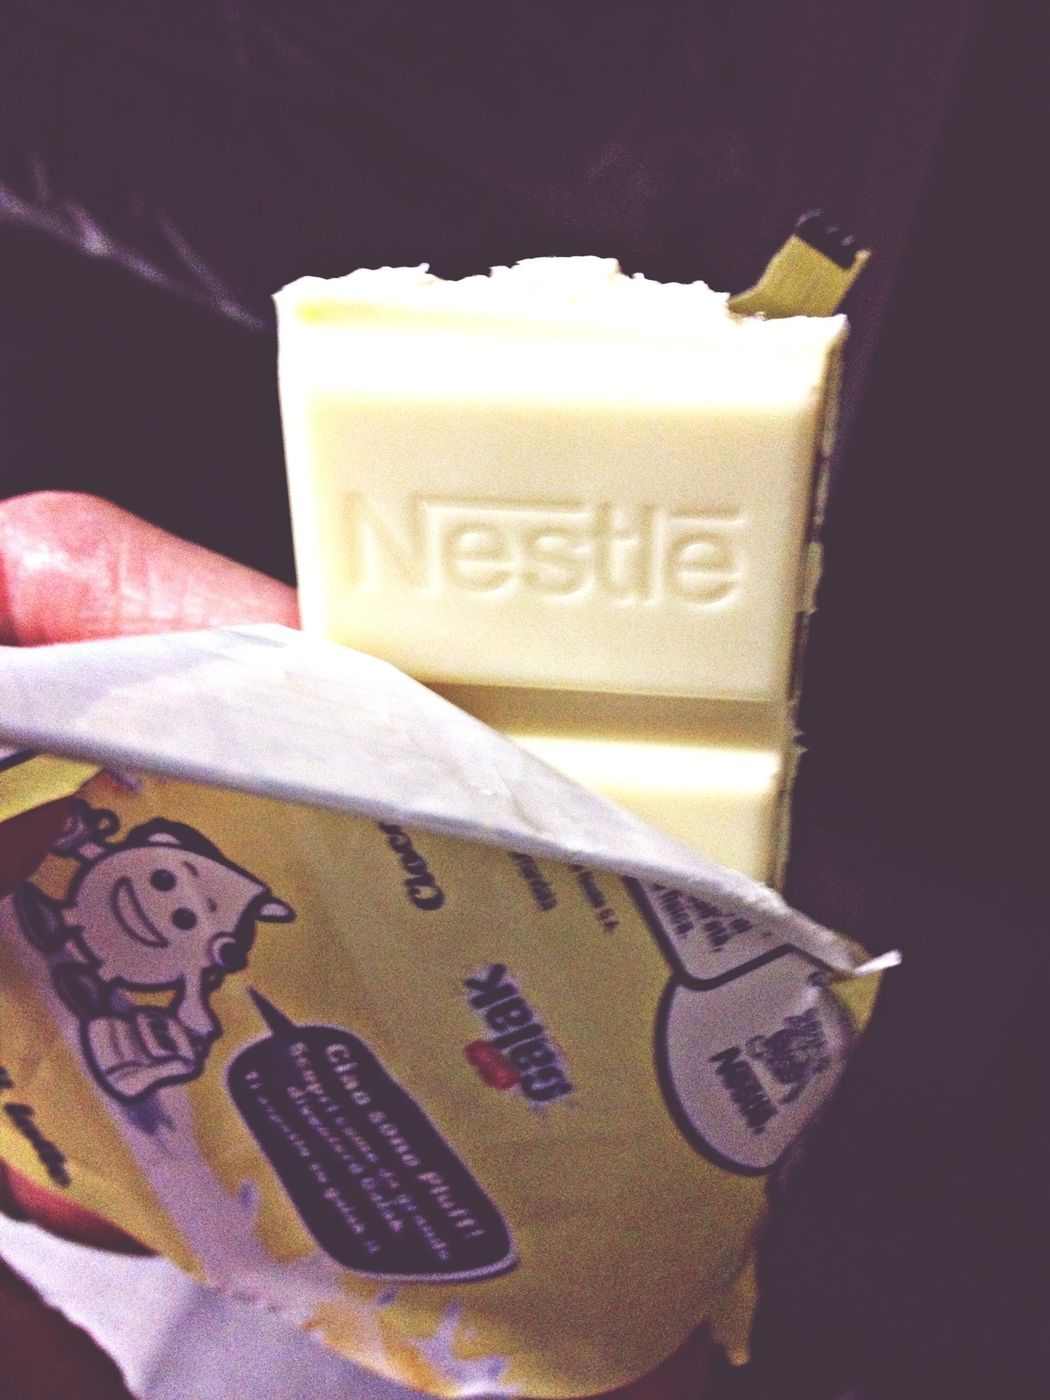 Nestle Snack Snack Time! Chocolate